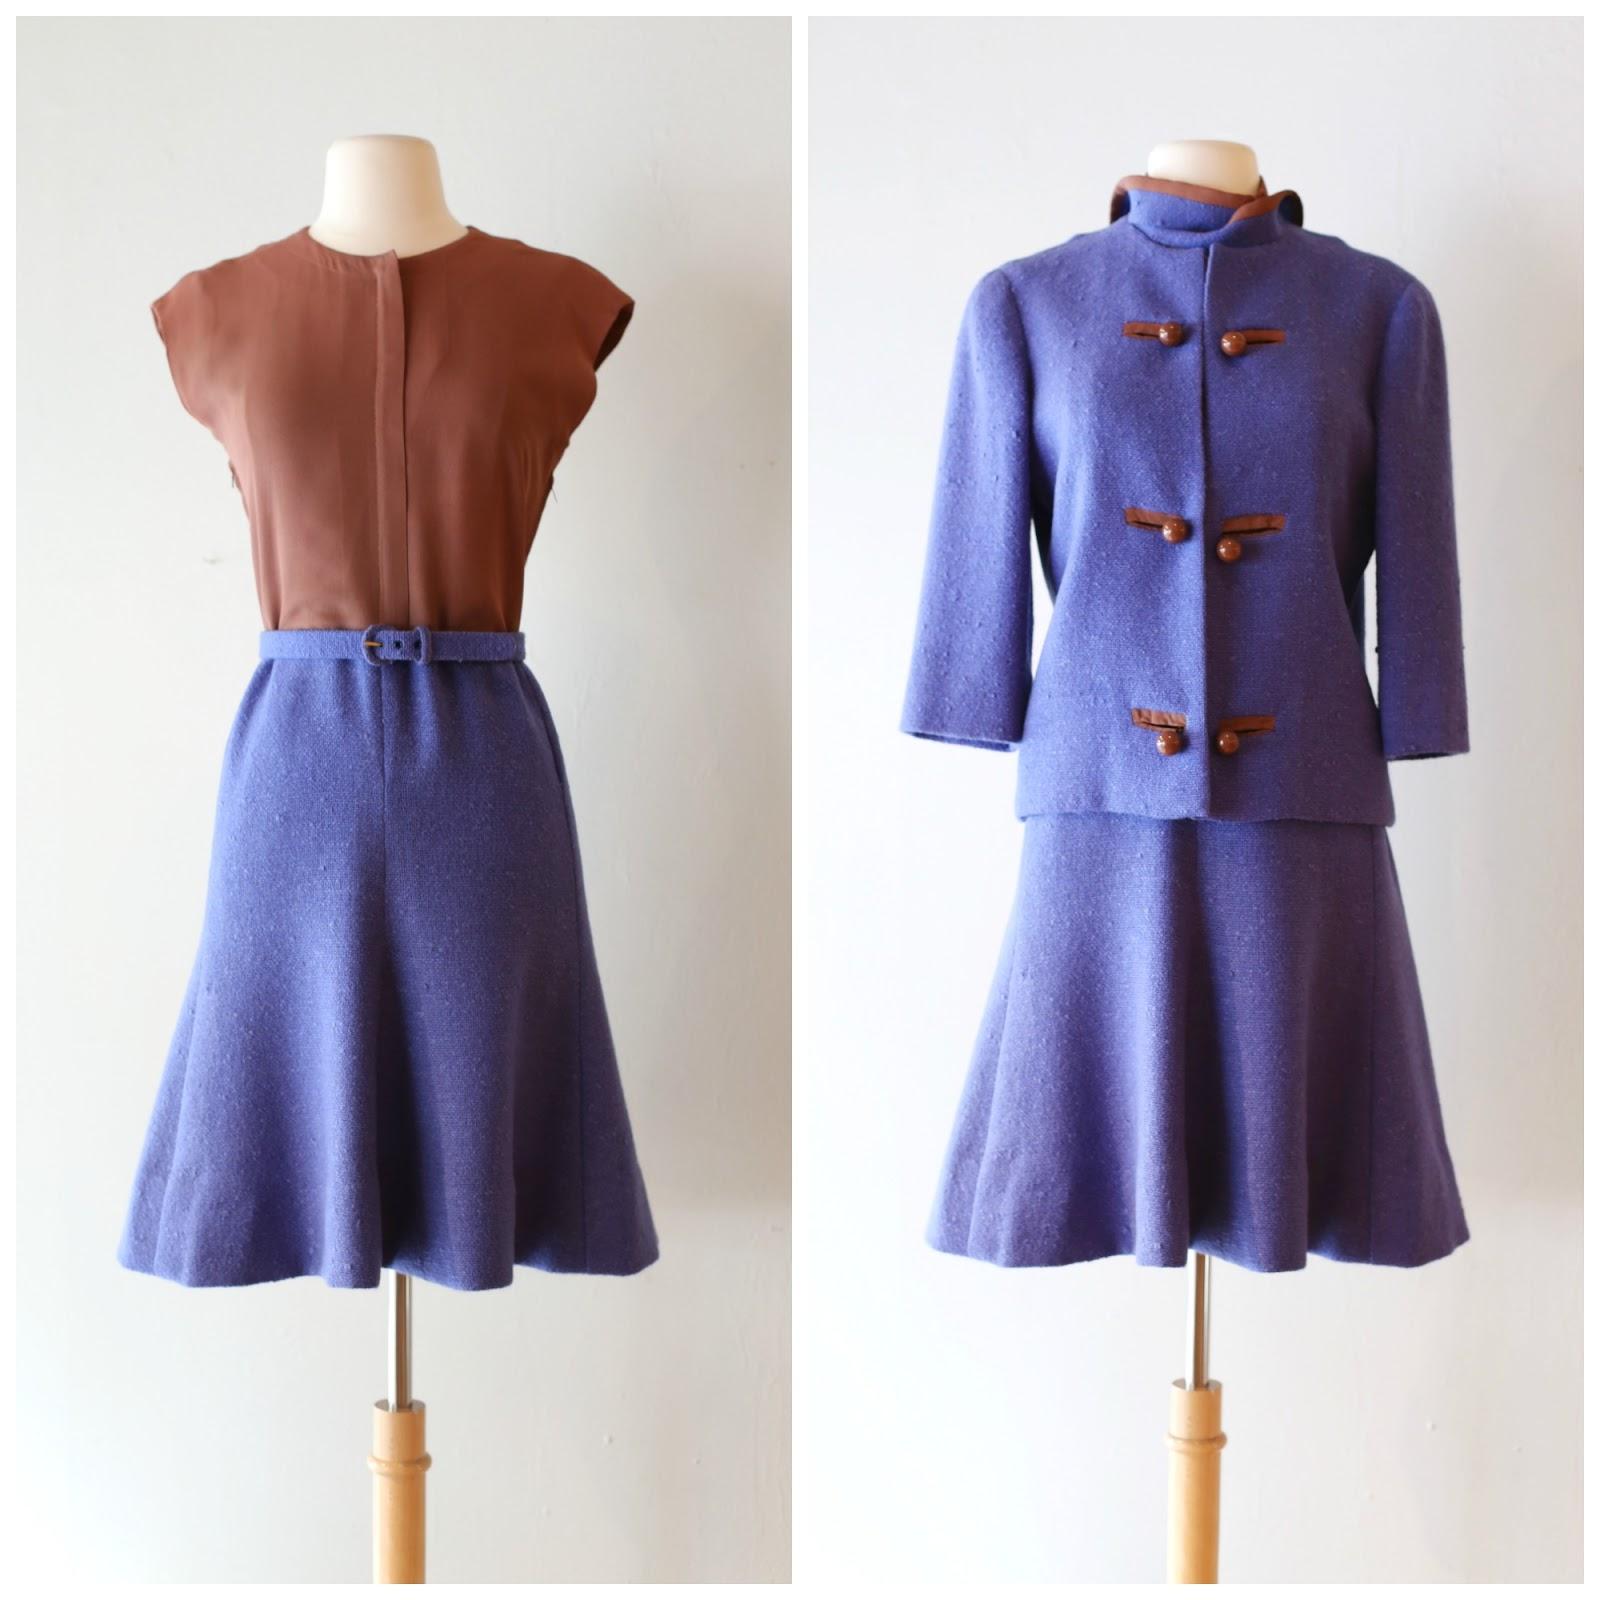 Xtabay Vintage Clothing Boutique - Portland, Oregon: New Arrivals